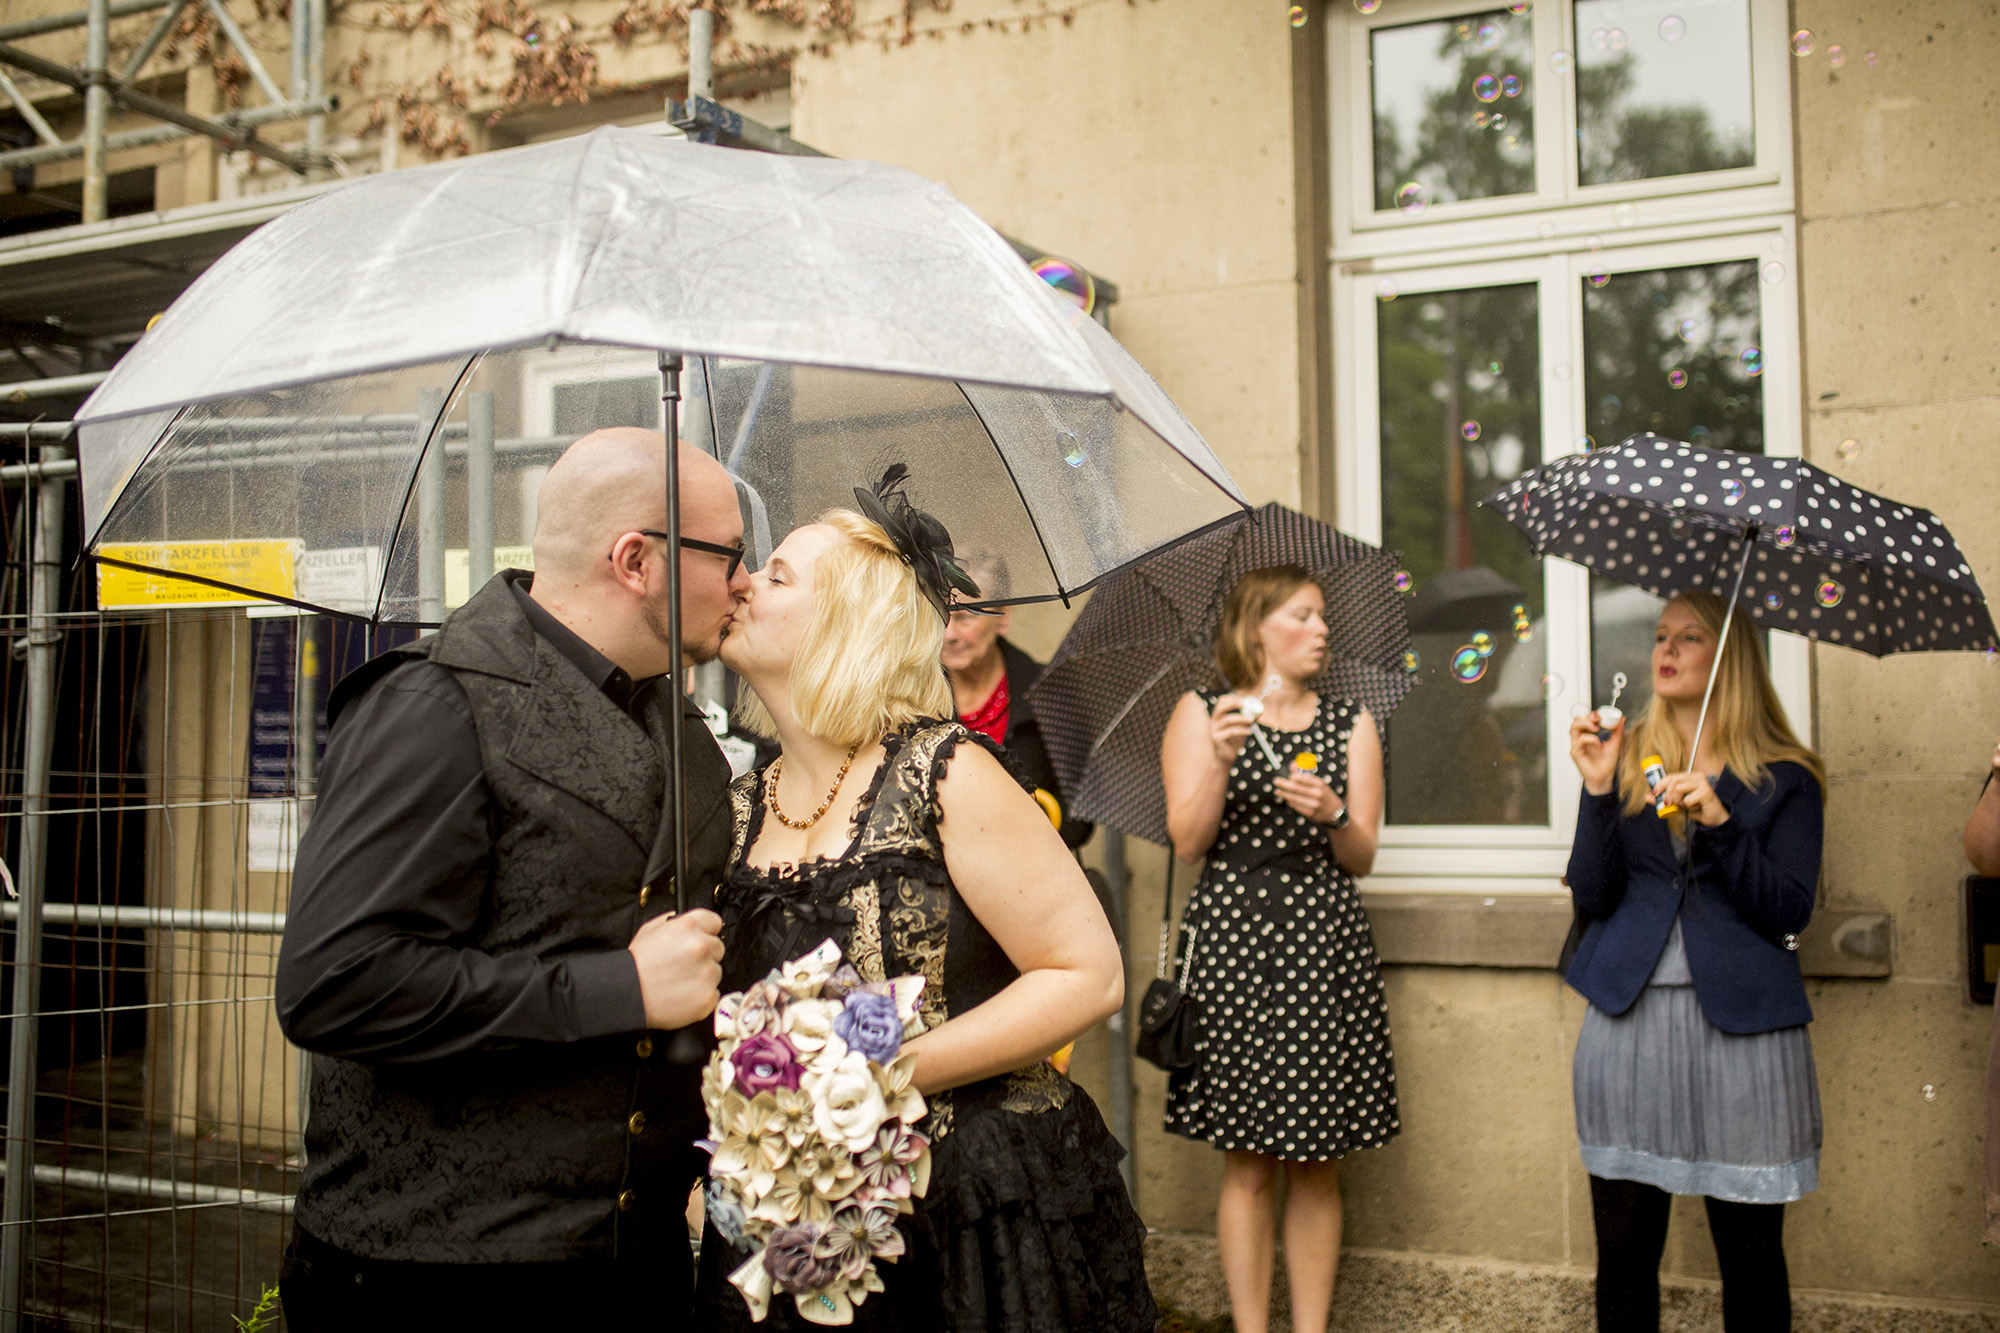 Seriously_Sabrina_Photography_Essen_Germany_RocknRoll_Hochzeit_Wedding_PatrickJenny48.jpg